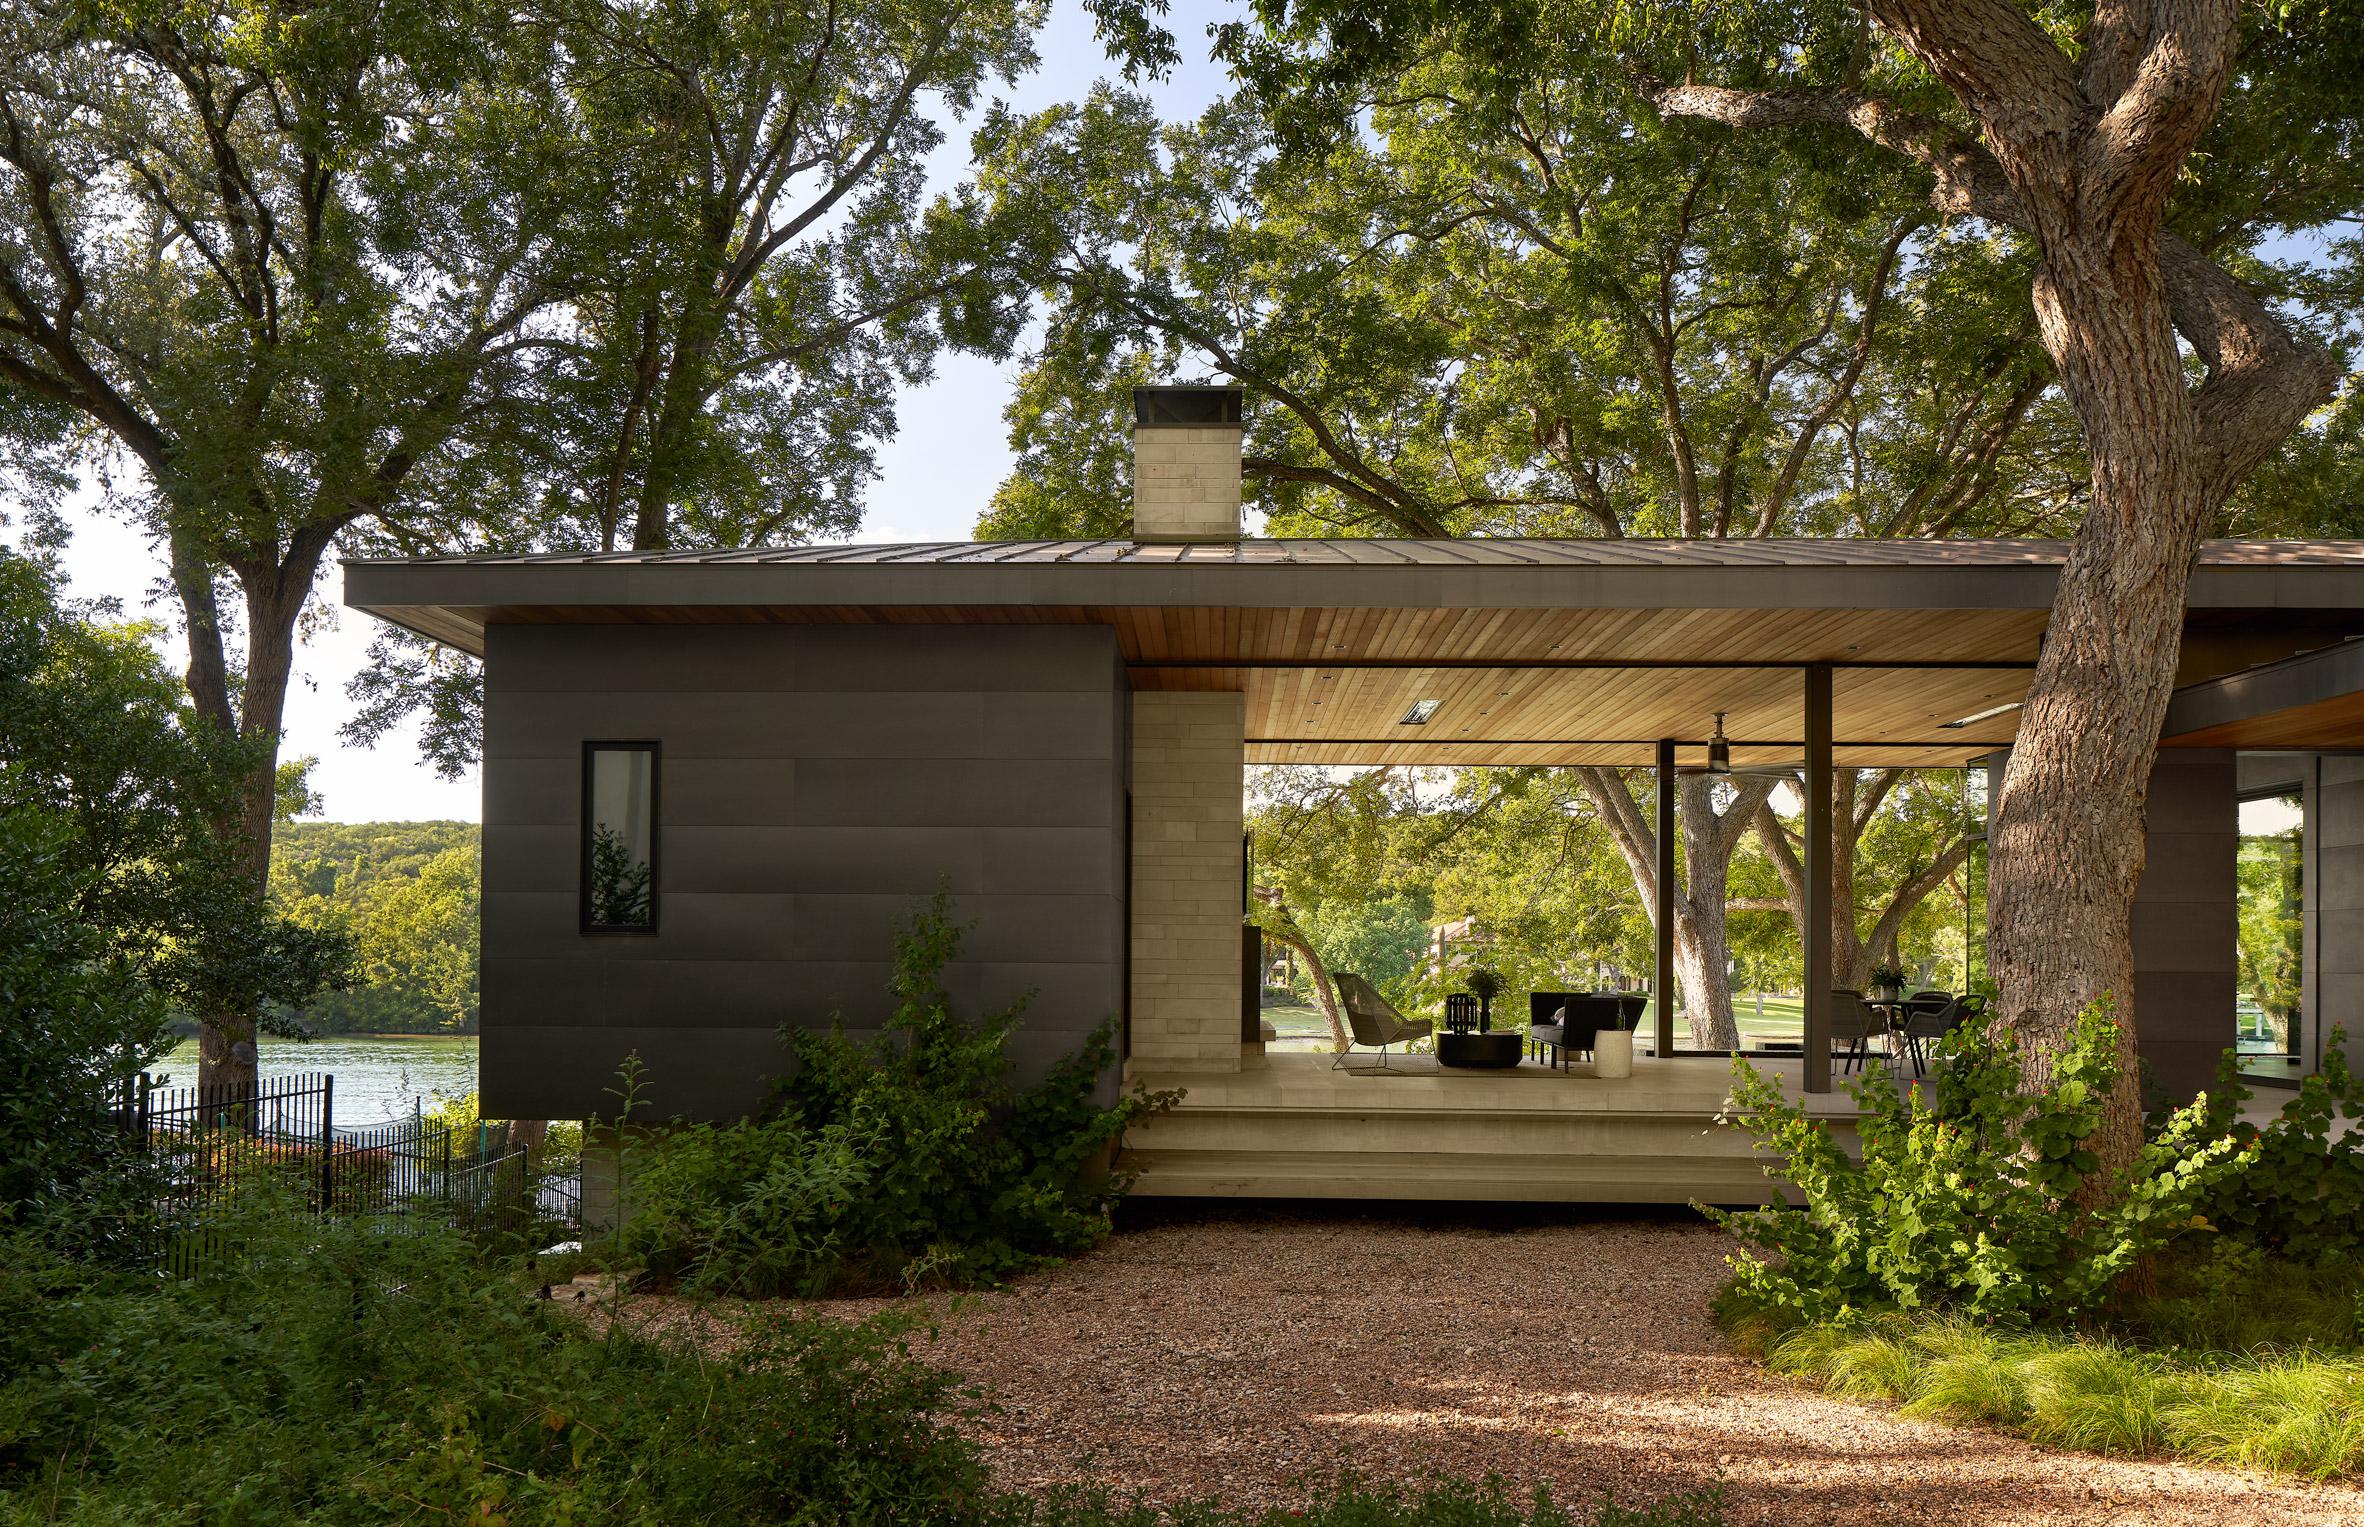 Britt Design Group conceived the interior design